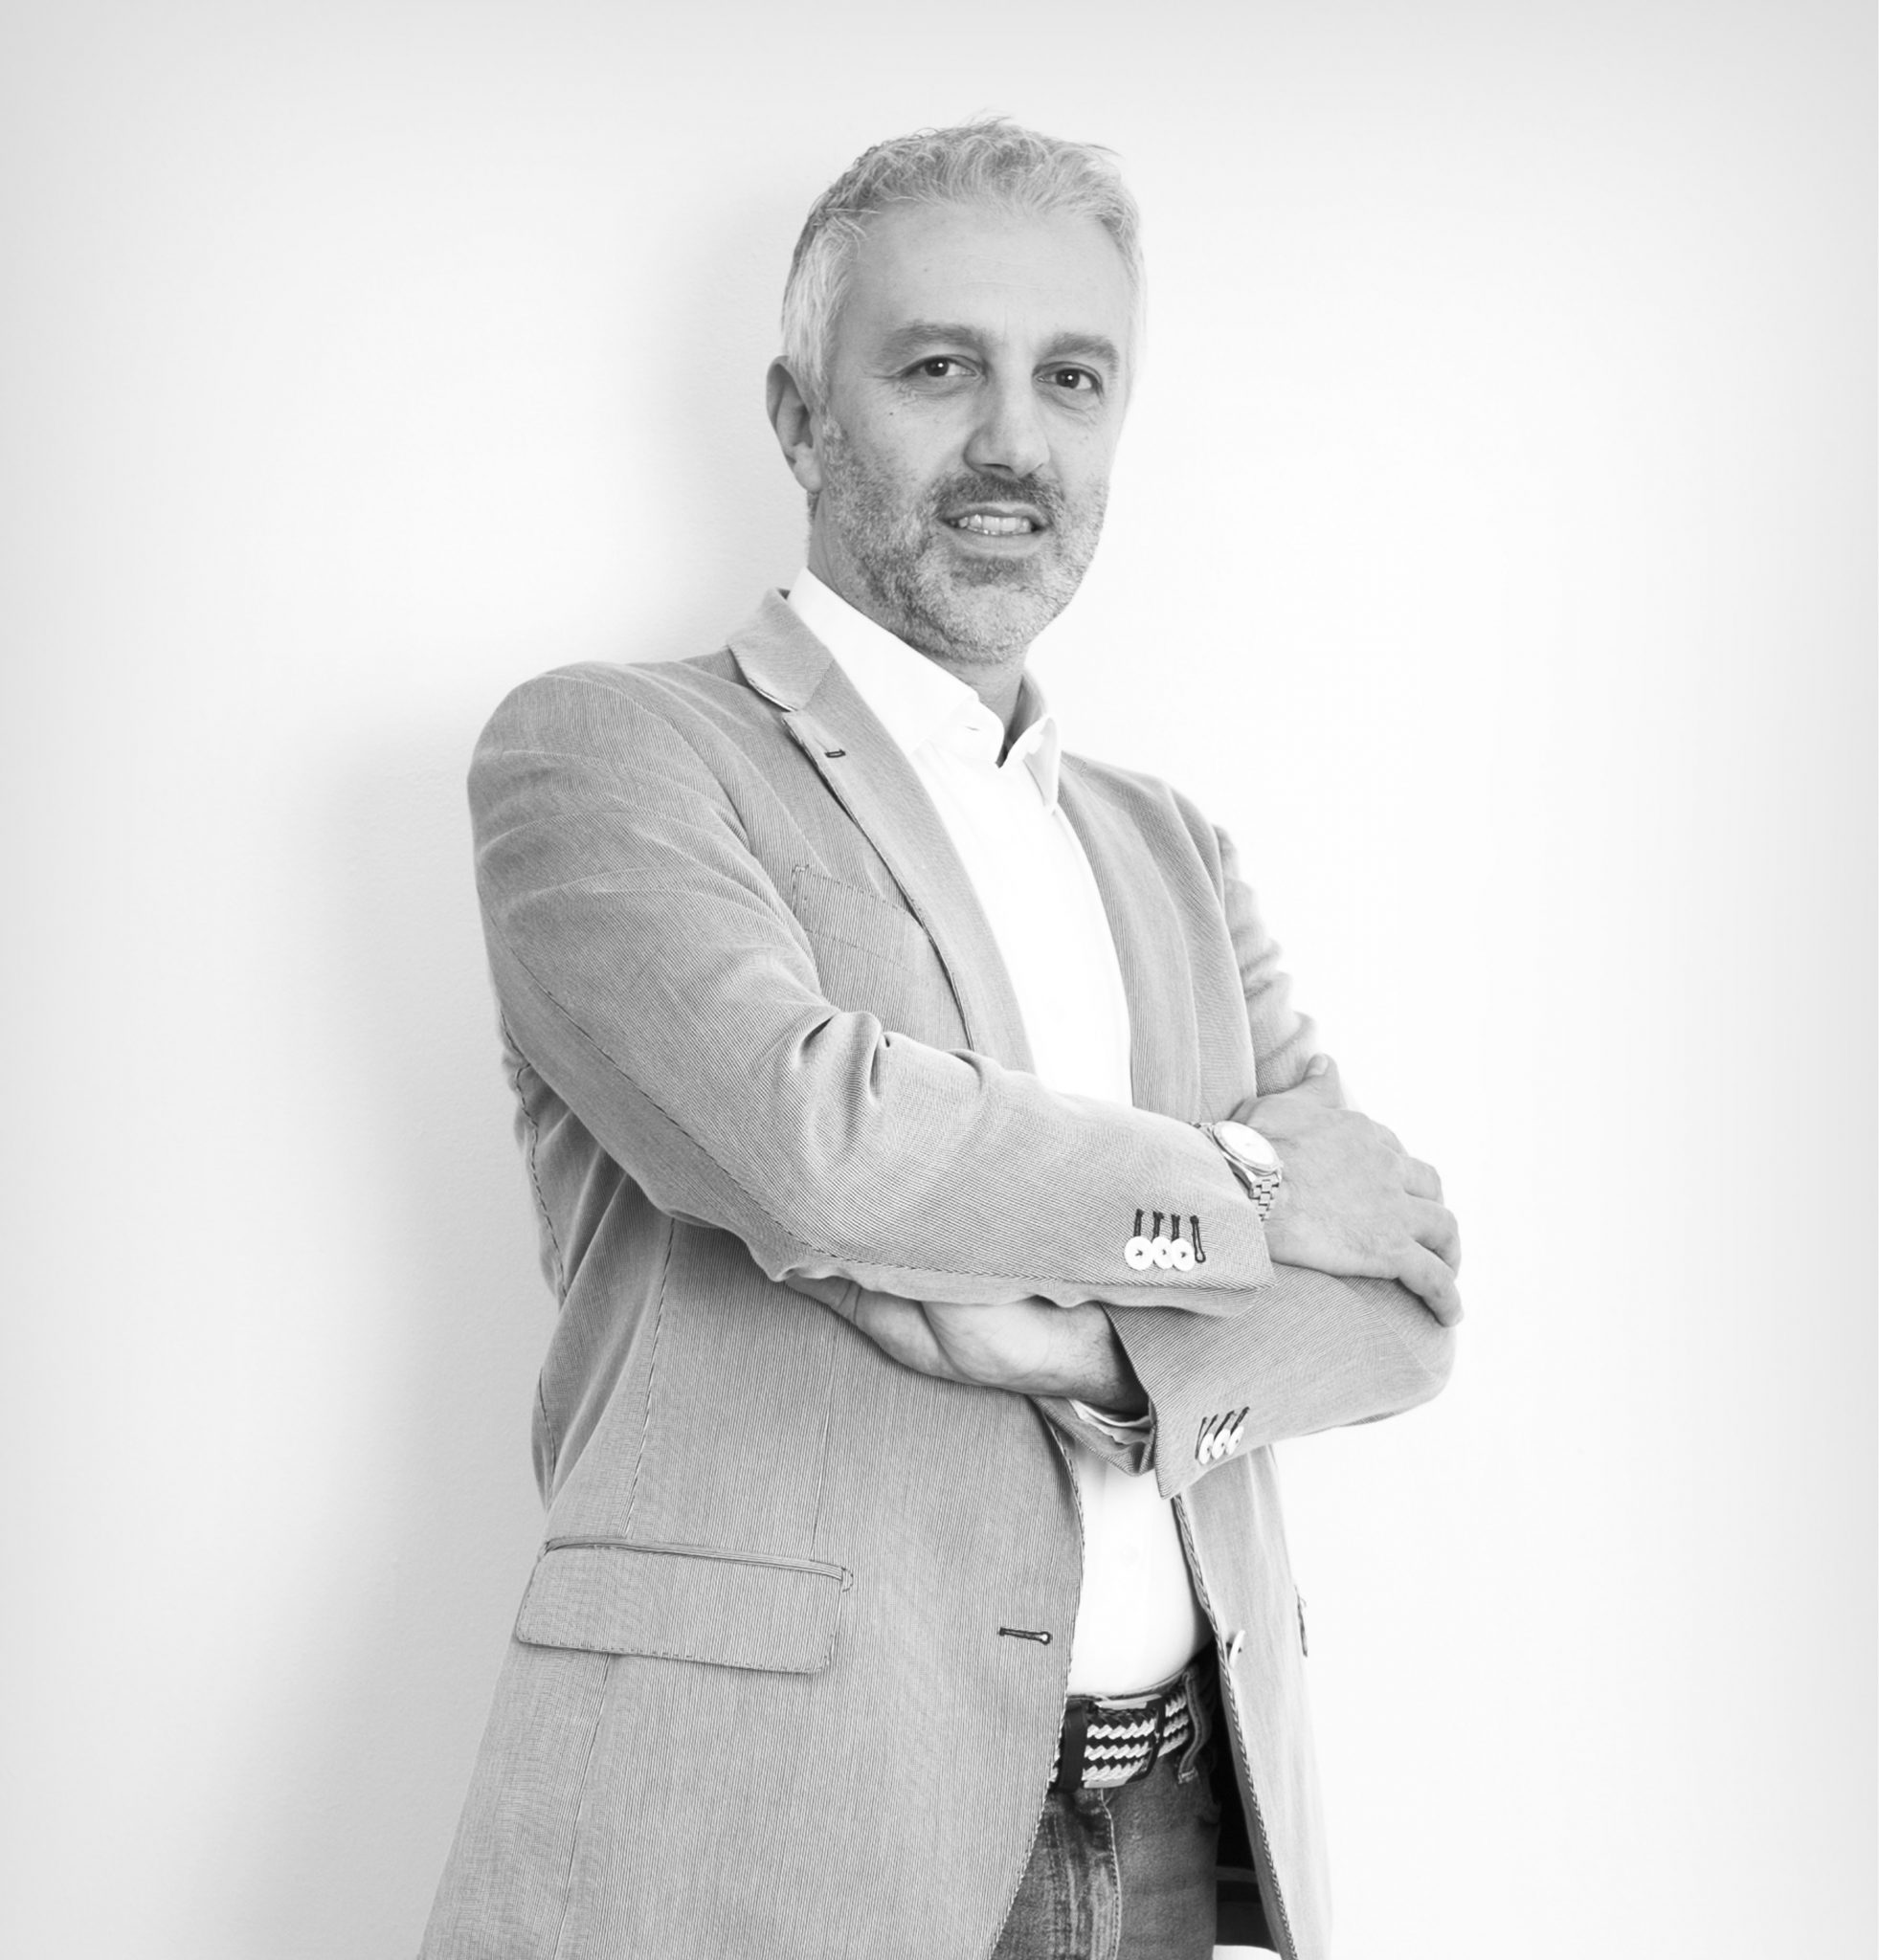 Luigi Maino